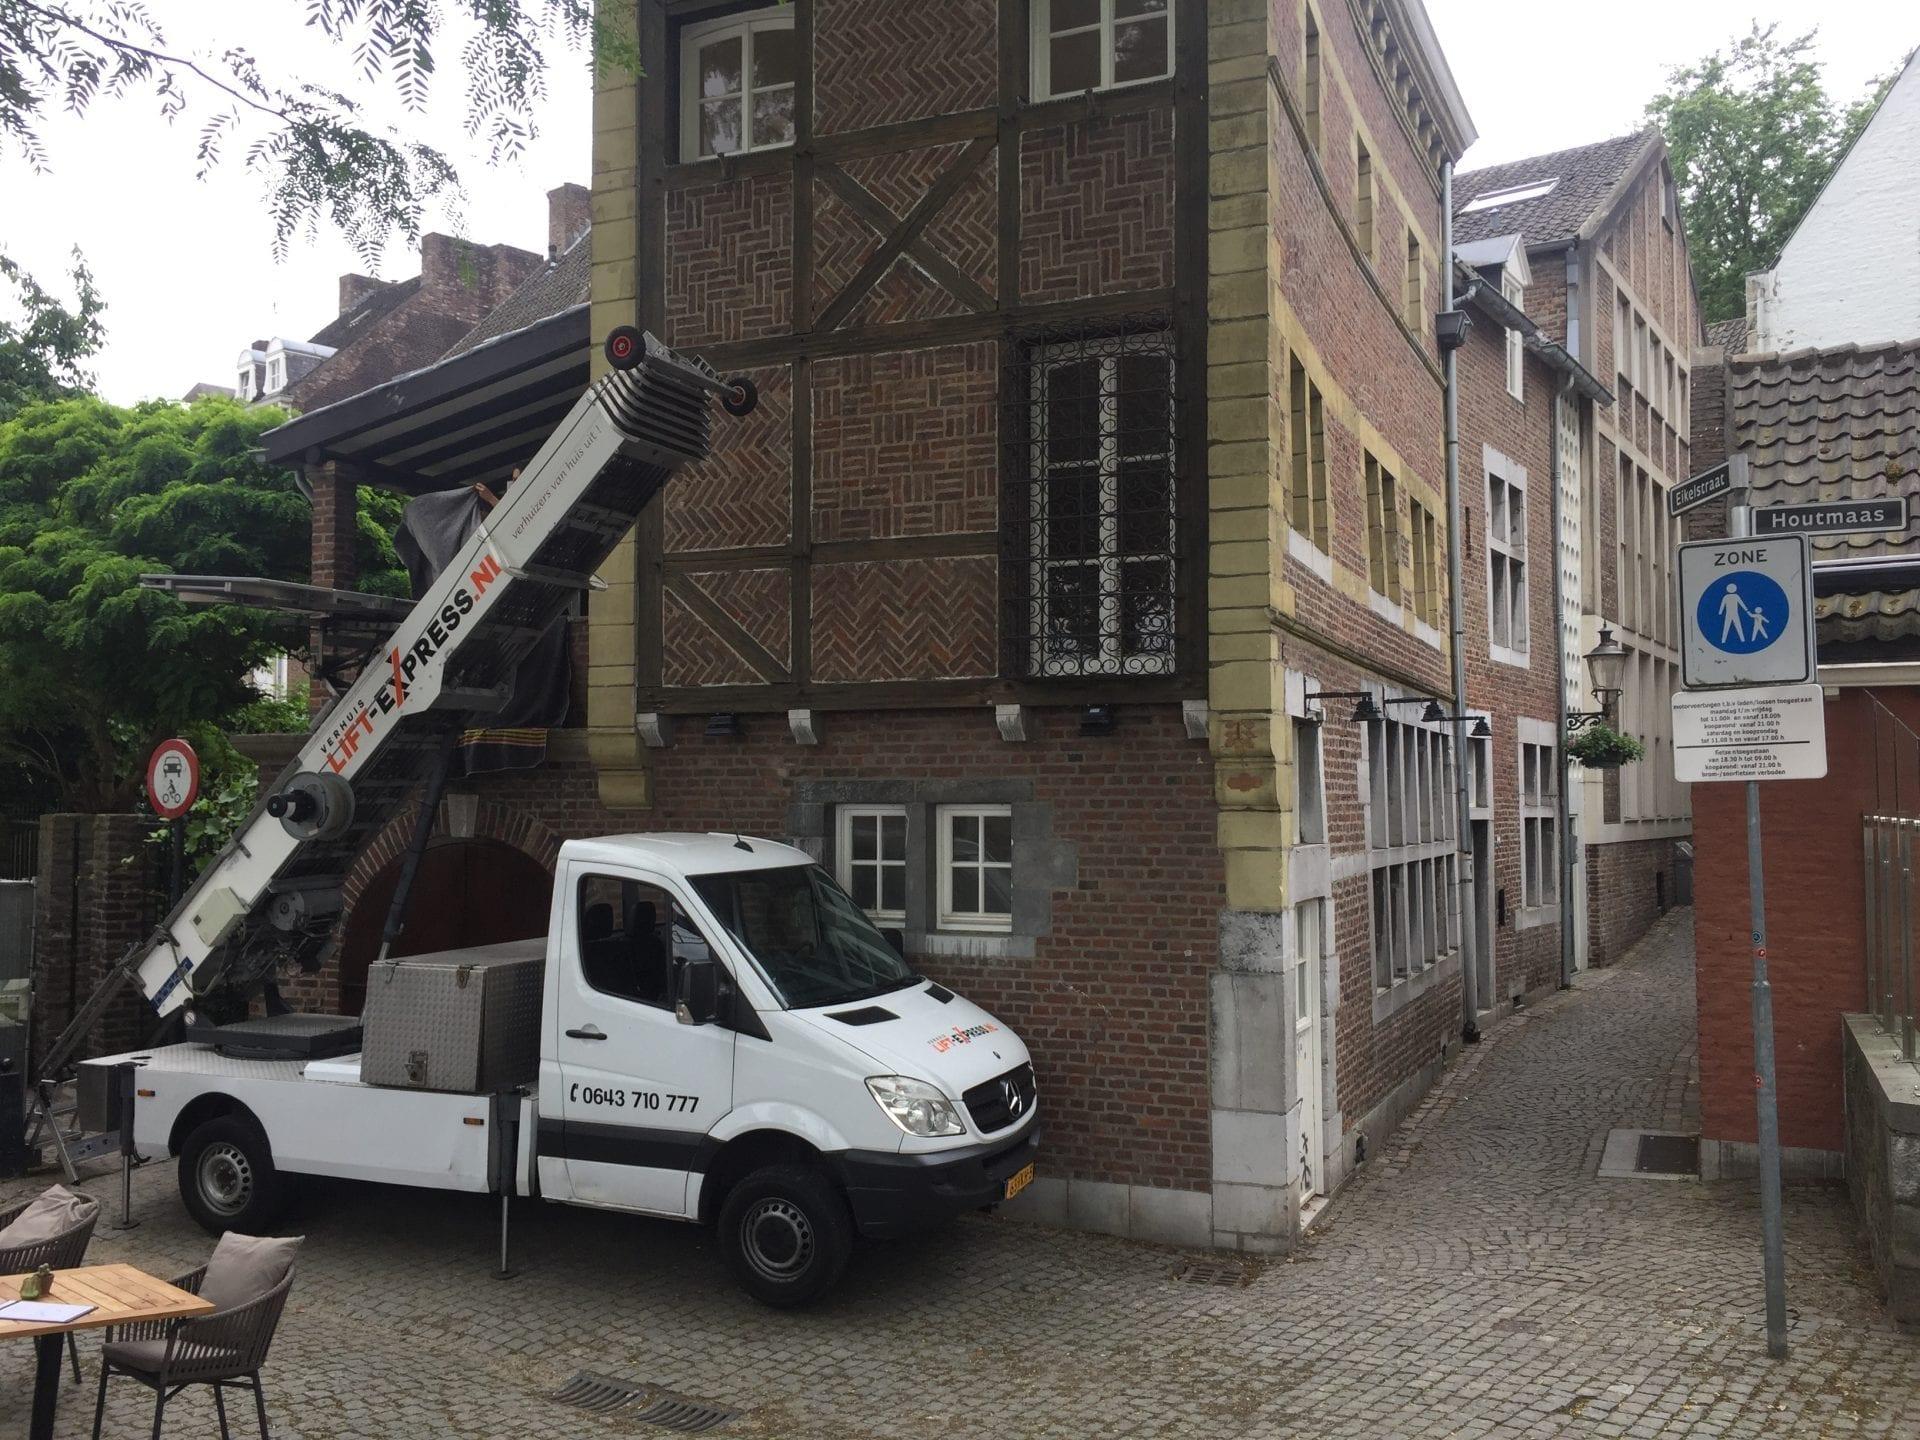 Verhuizing Houtmaas Maastricht